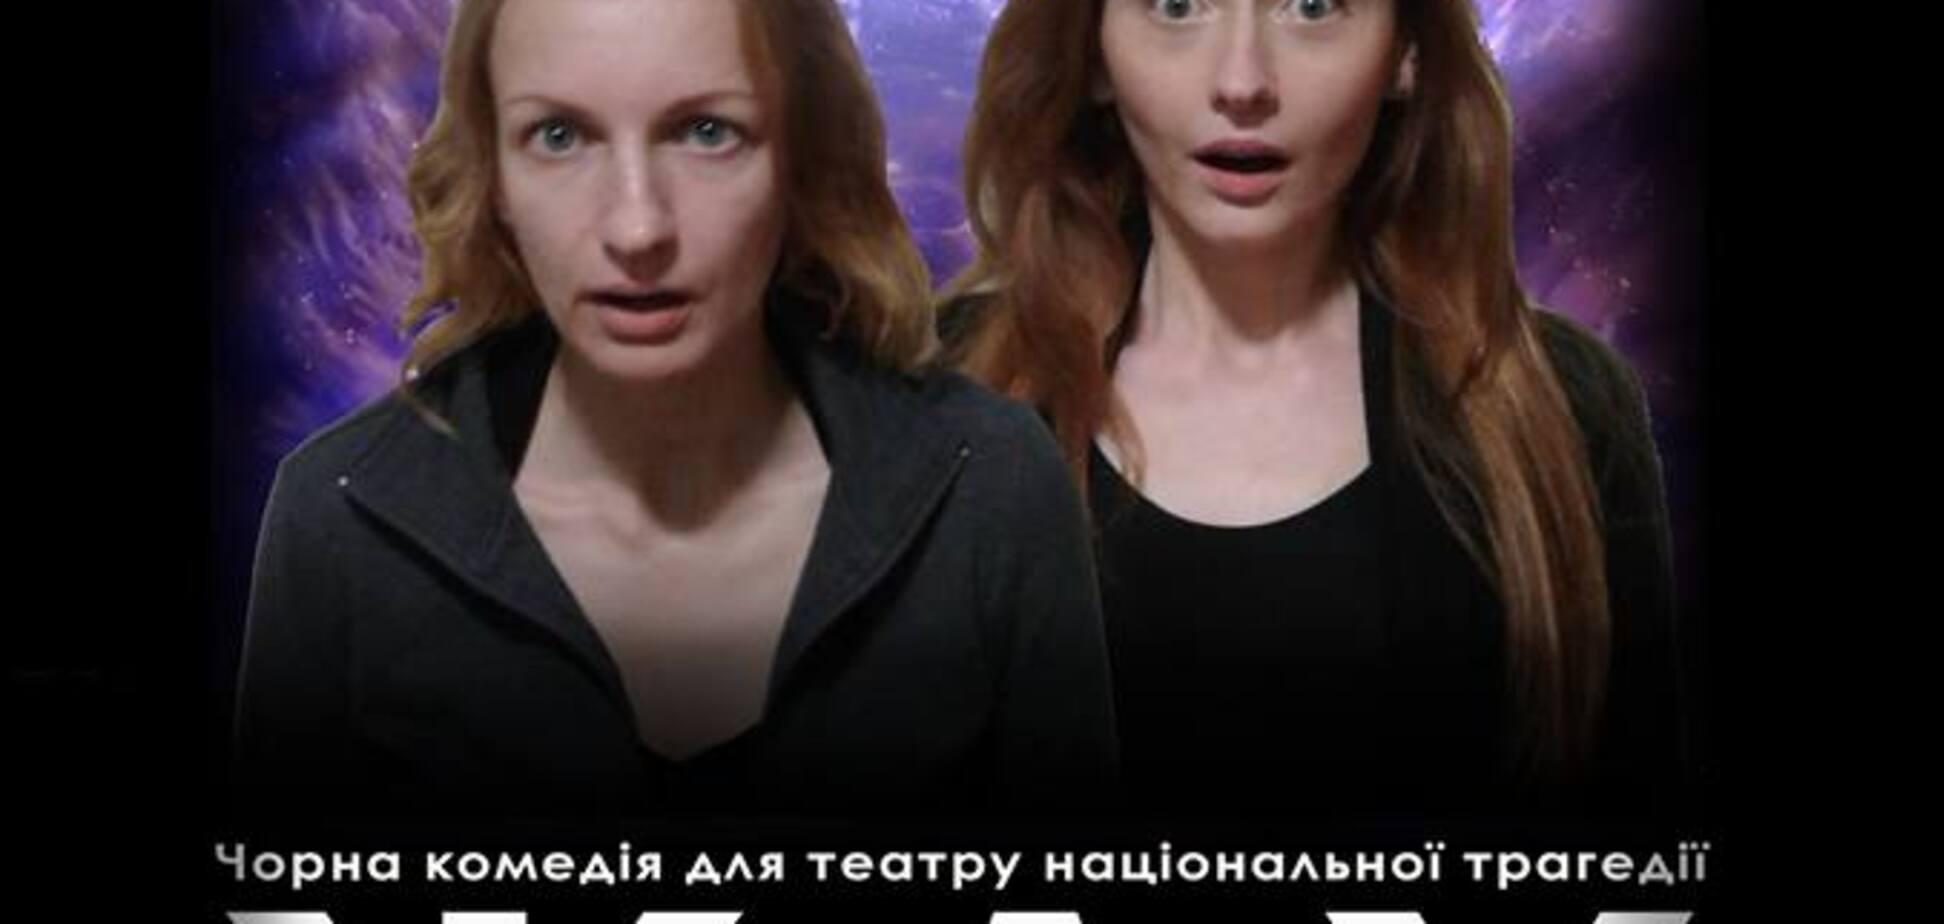 Маріупольський театр покаже в Києві спектакль про морг